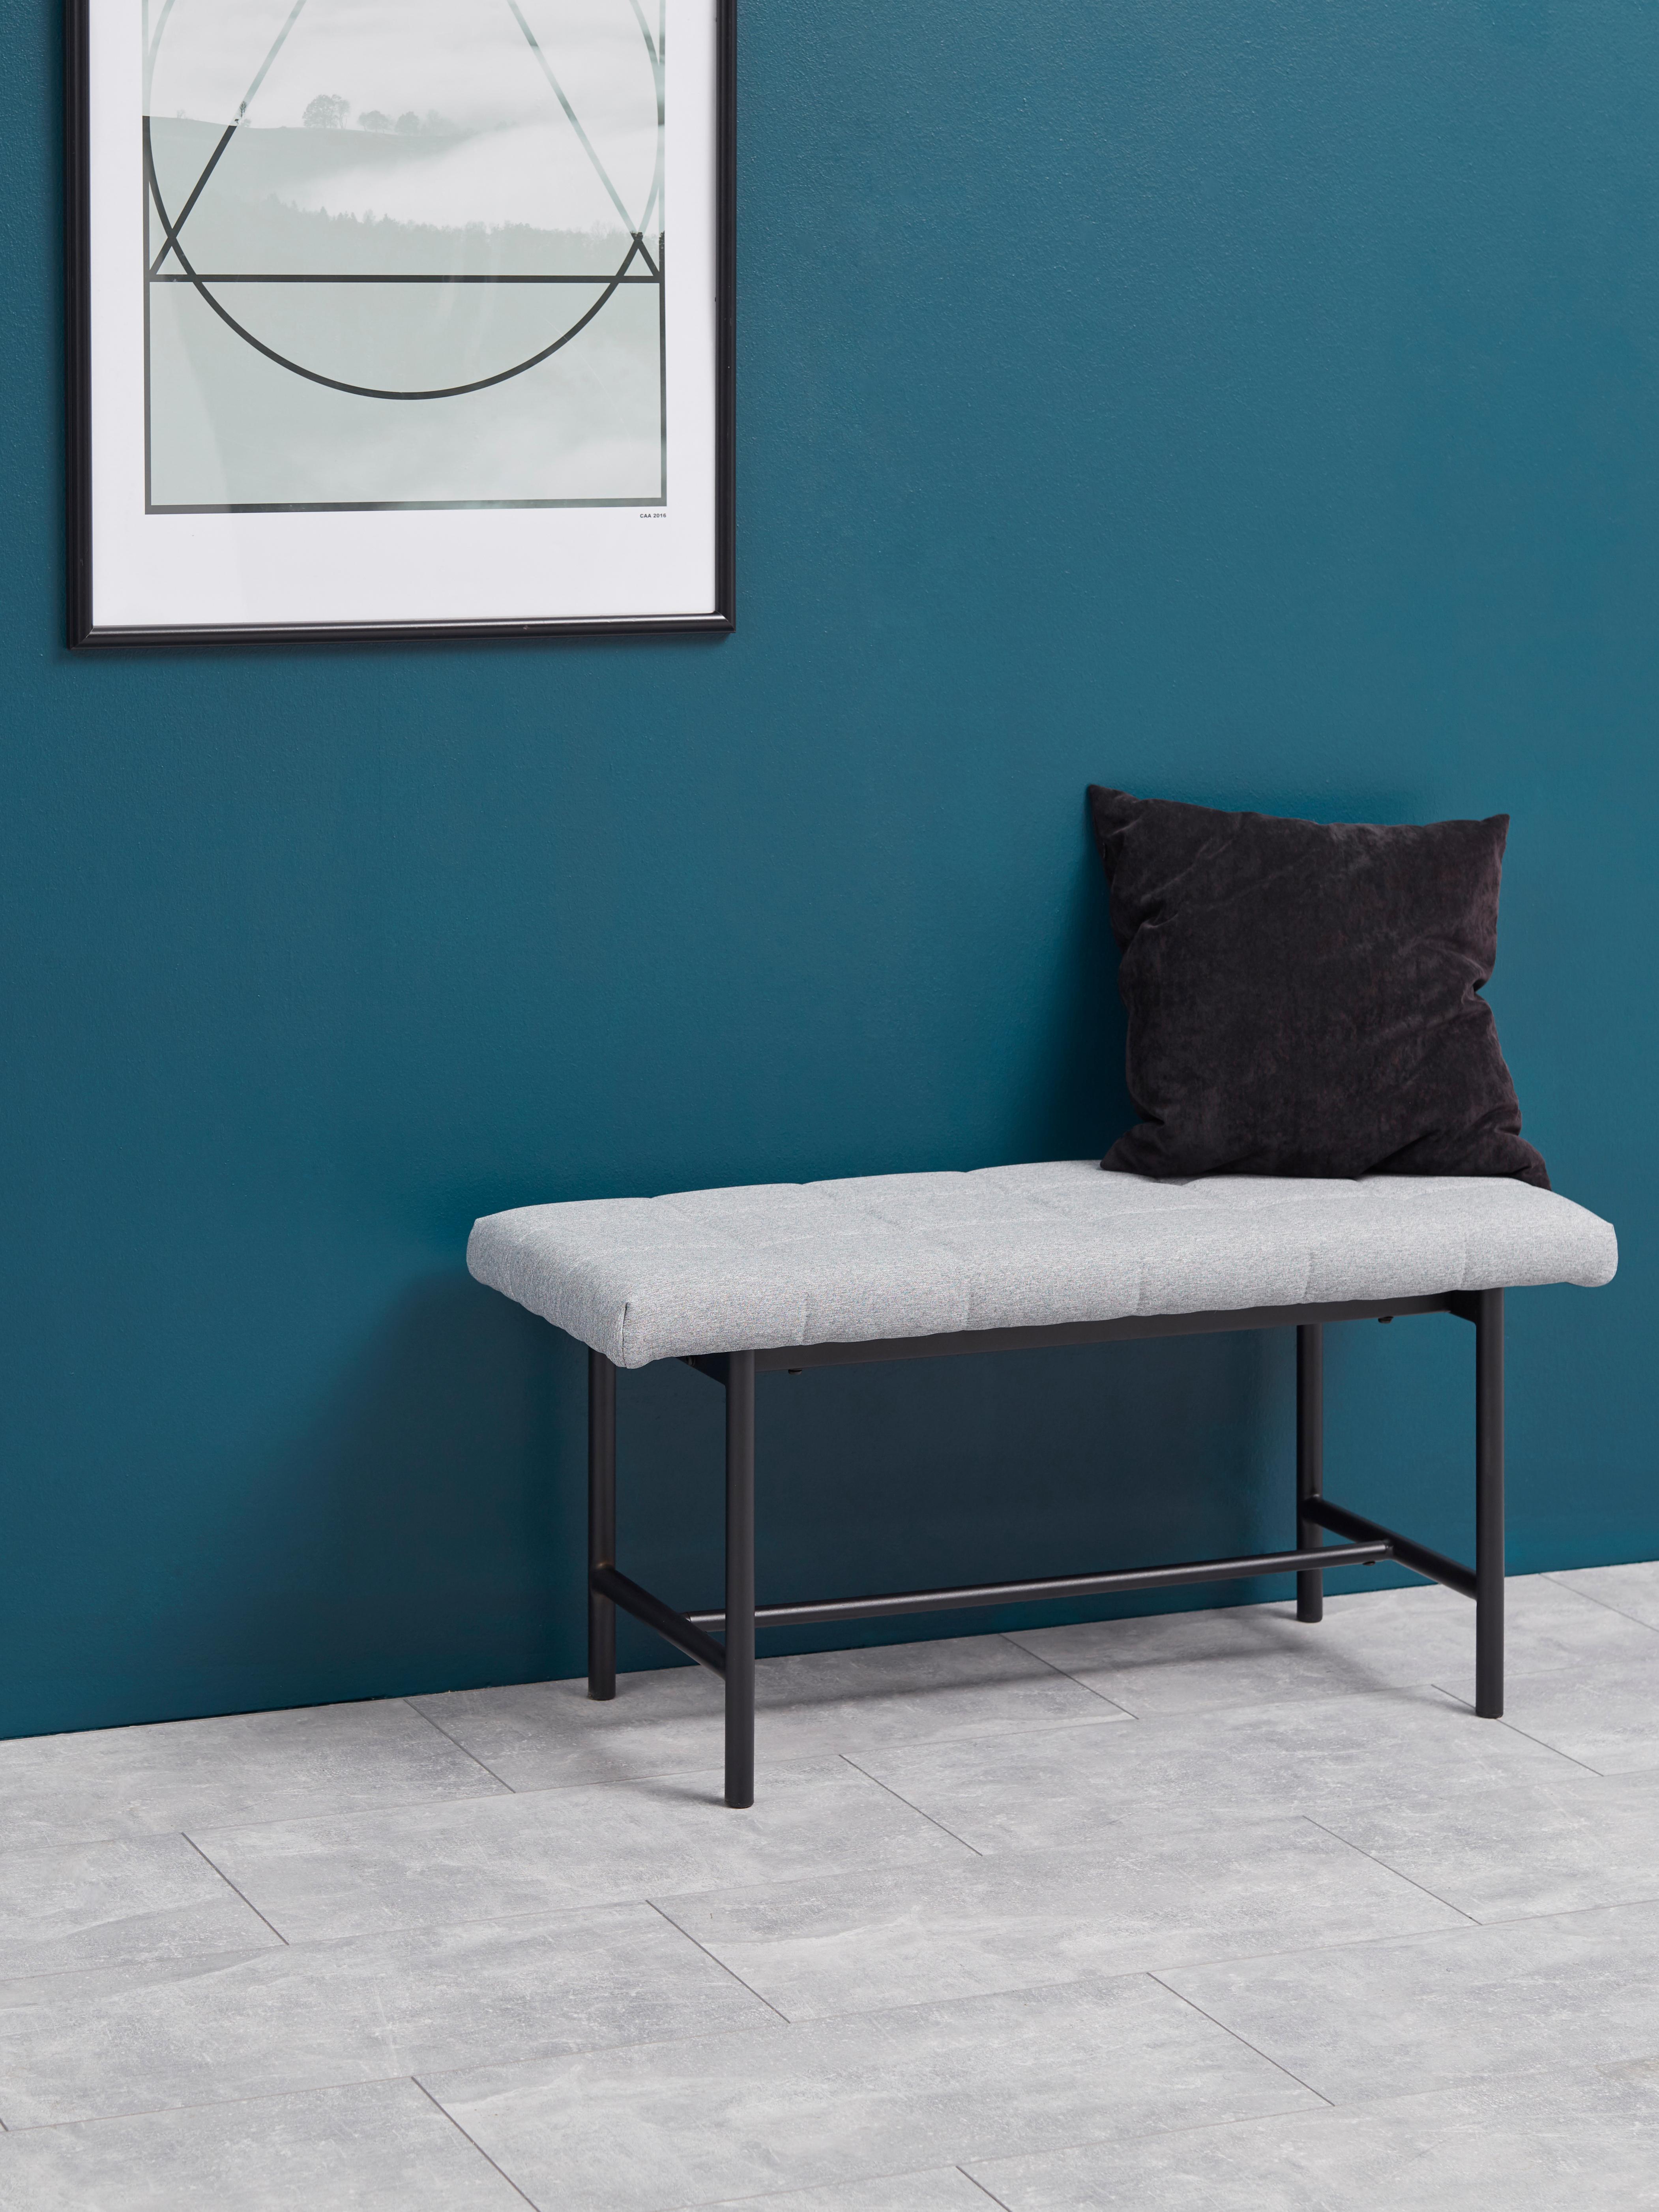 Design Polsterbank Sigfrid, Bezug: Polyester 25.000 Scheuert, Gestell: Schichtholz, Beine: Metall, pulverbeschichtet, Hellgrau, 100 x 47 cm